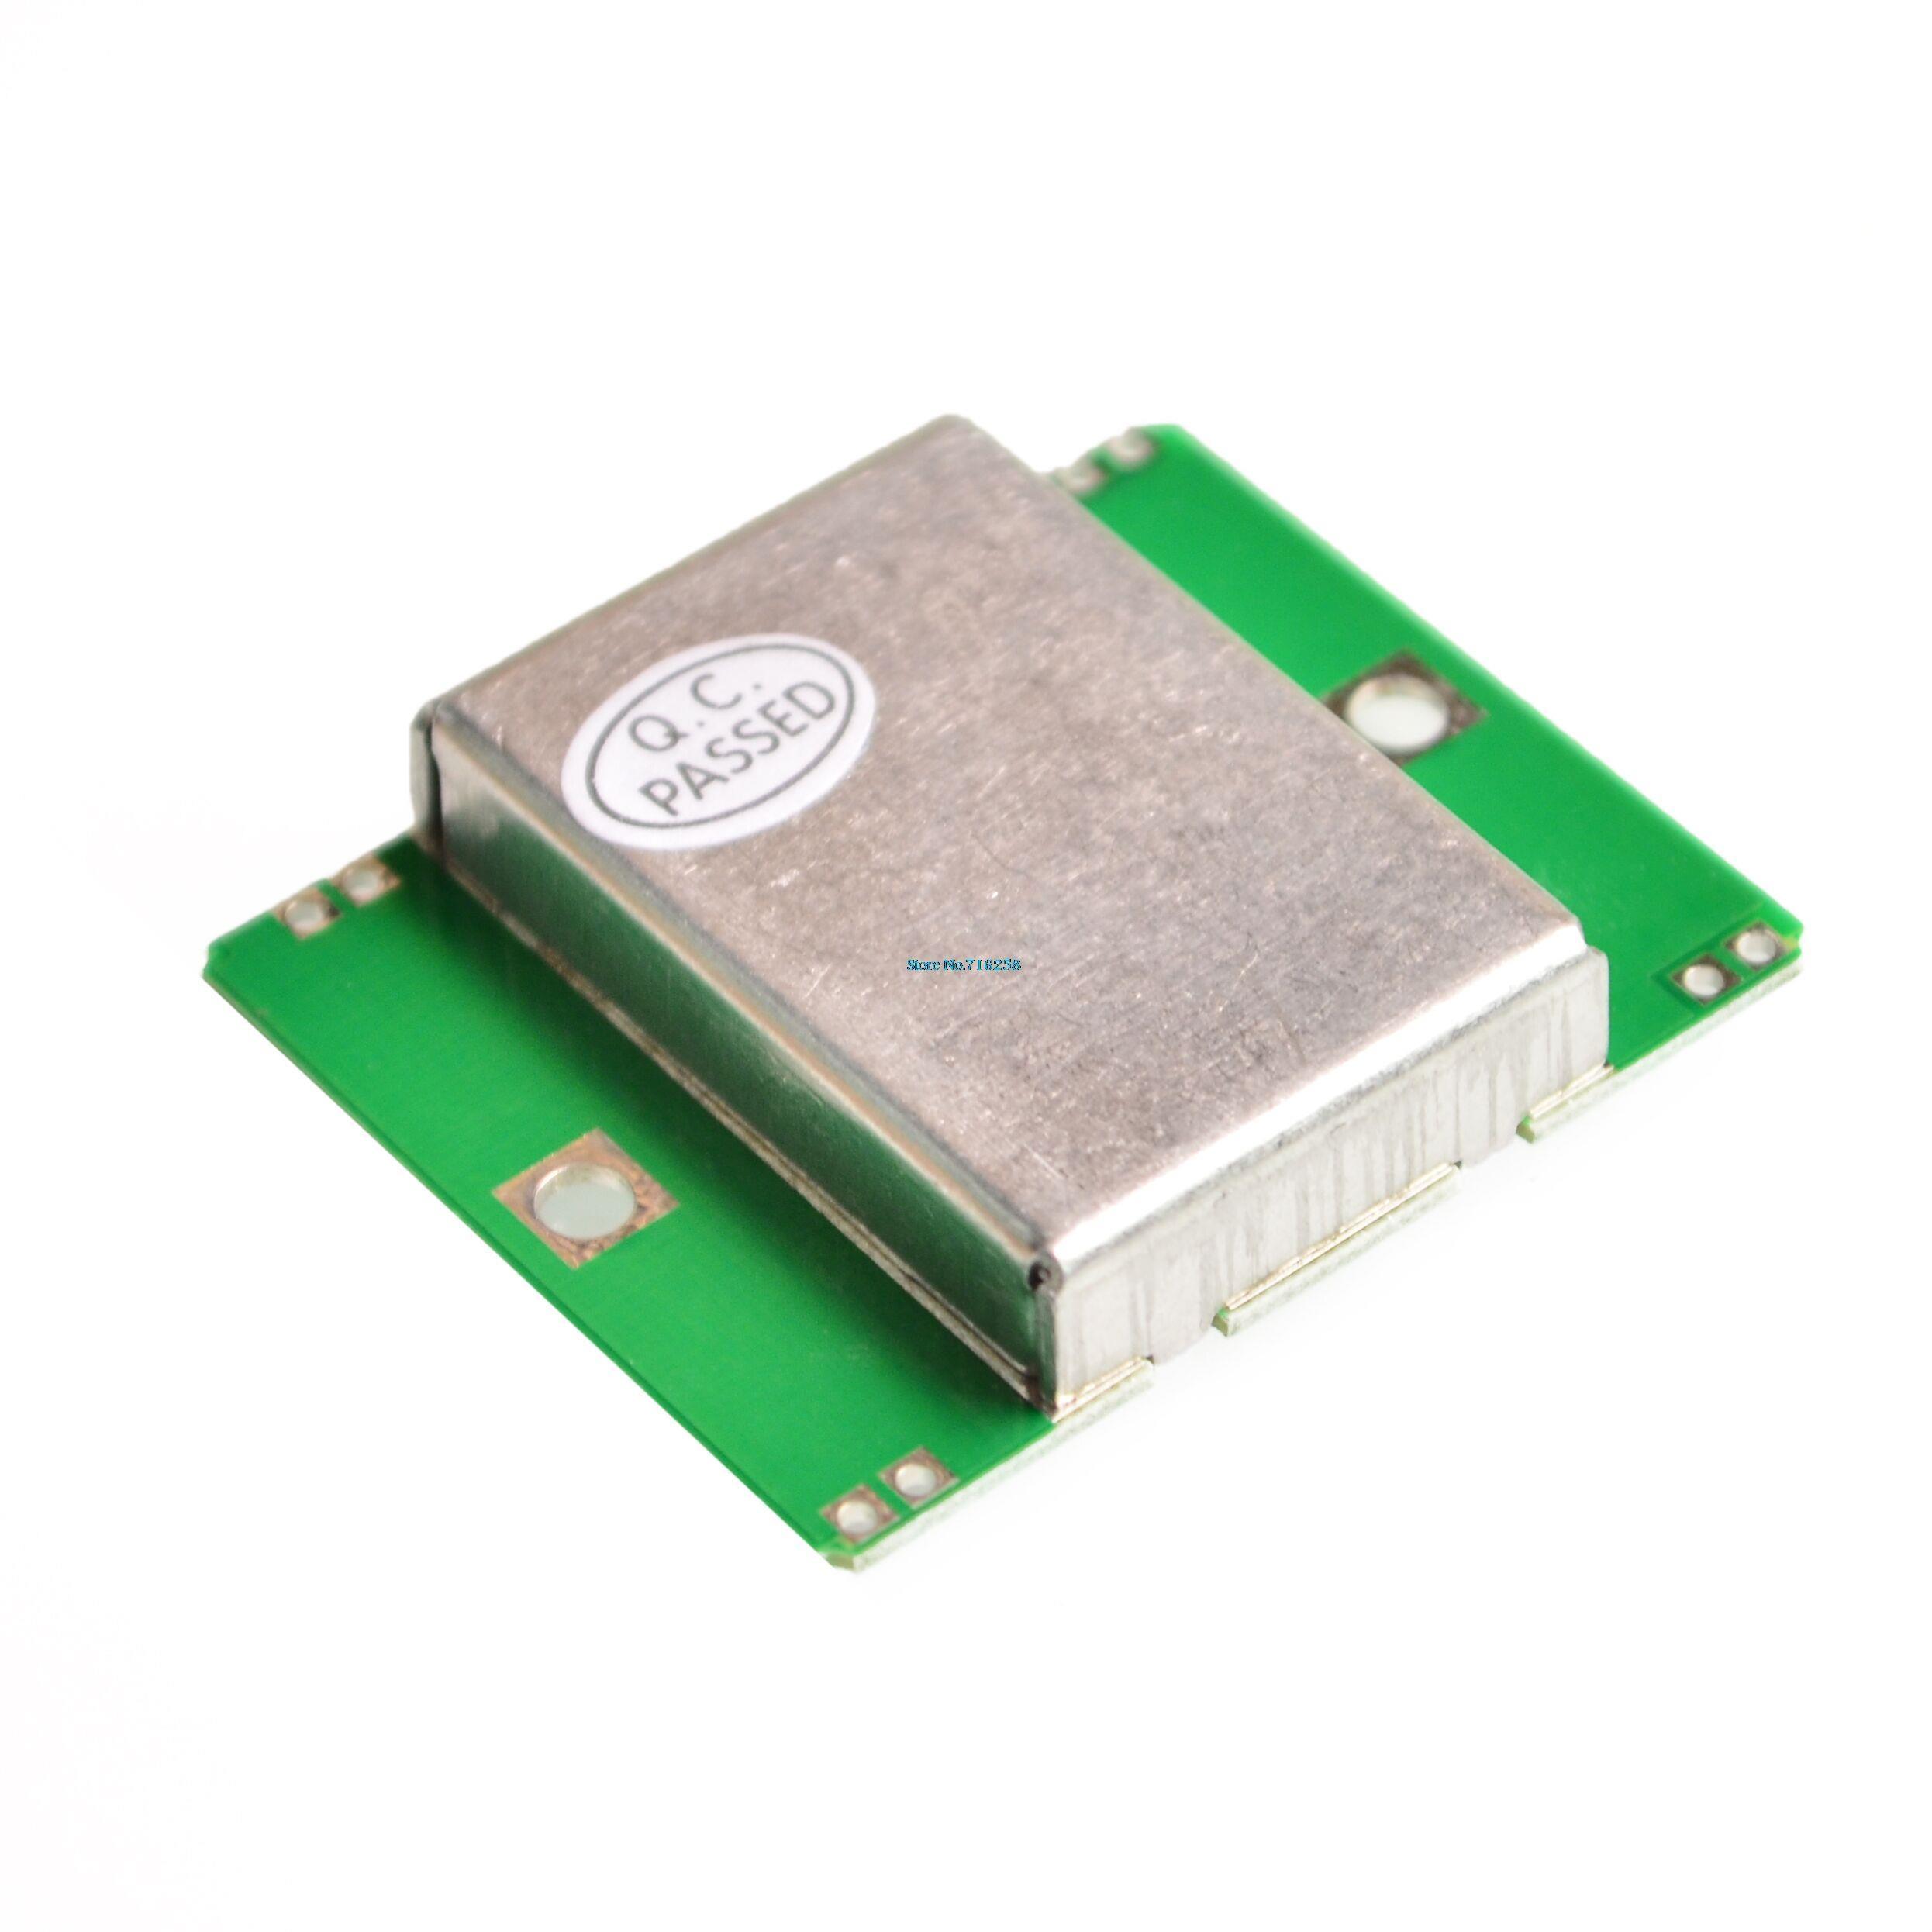 HB100 Microwave Doppler Radar Wireless Module Motion Sensor HB100, Microwave Motion Sensor, Motion Detector(China)